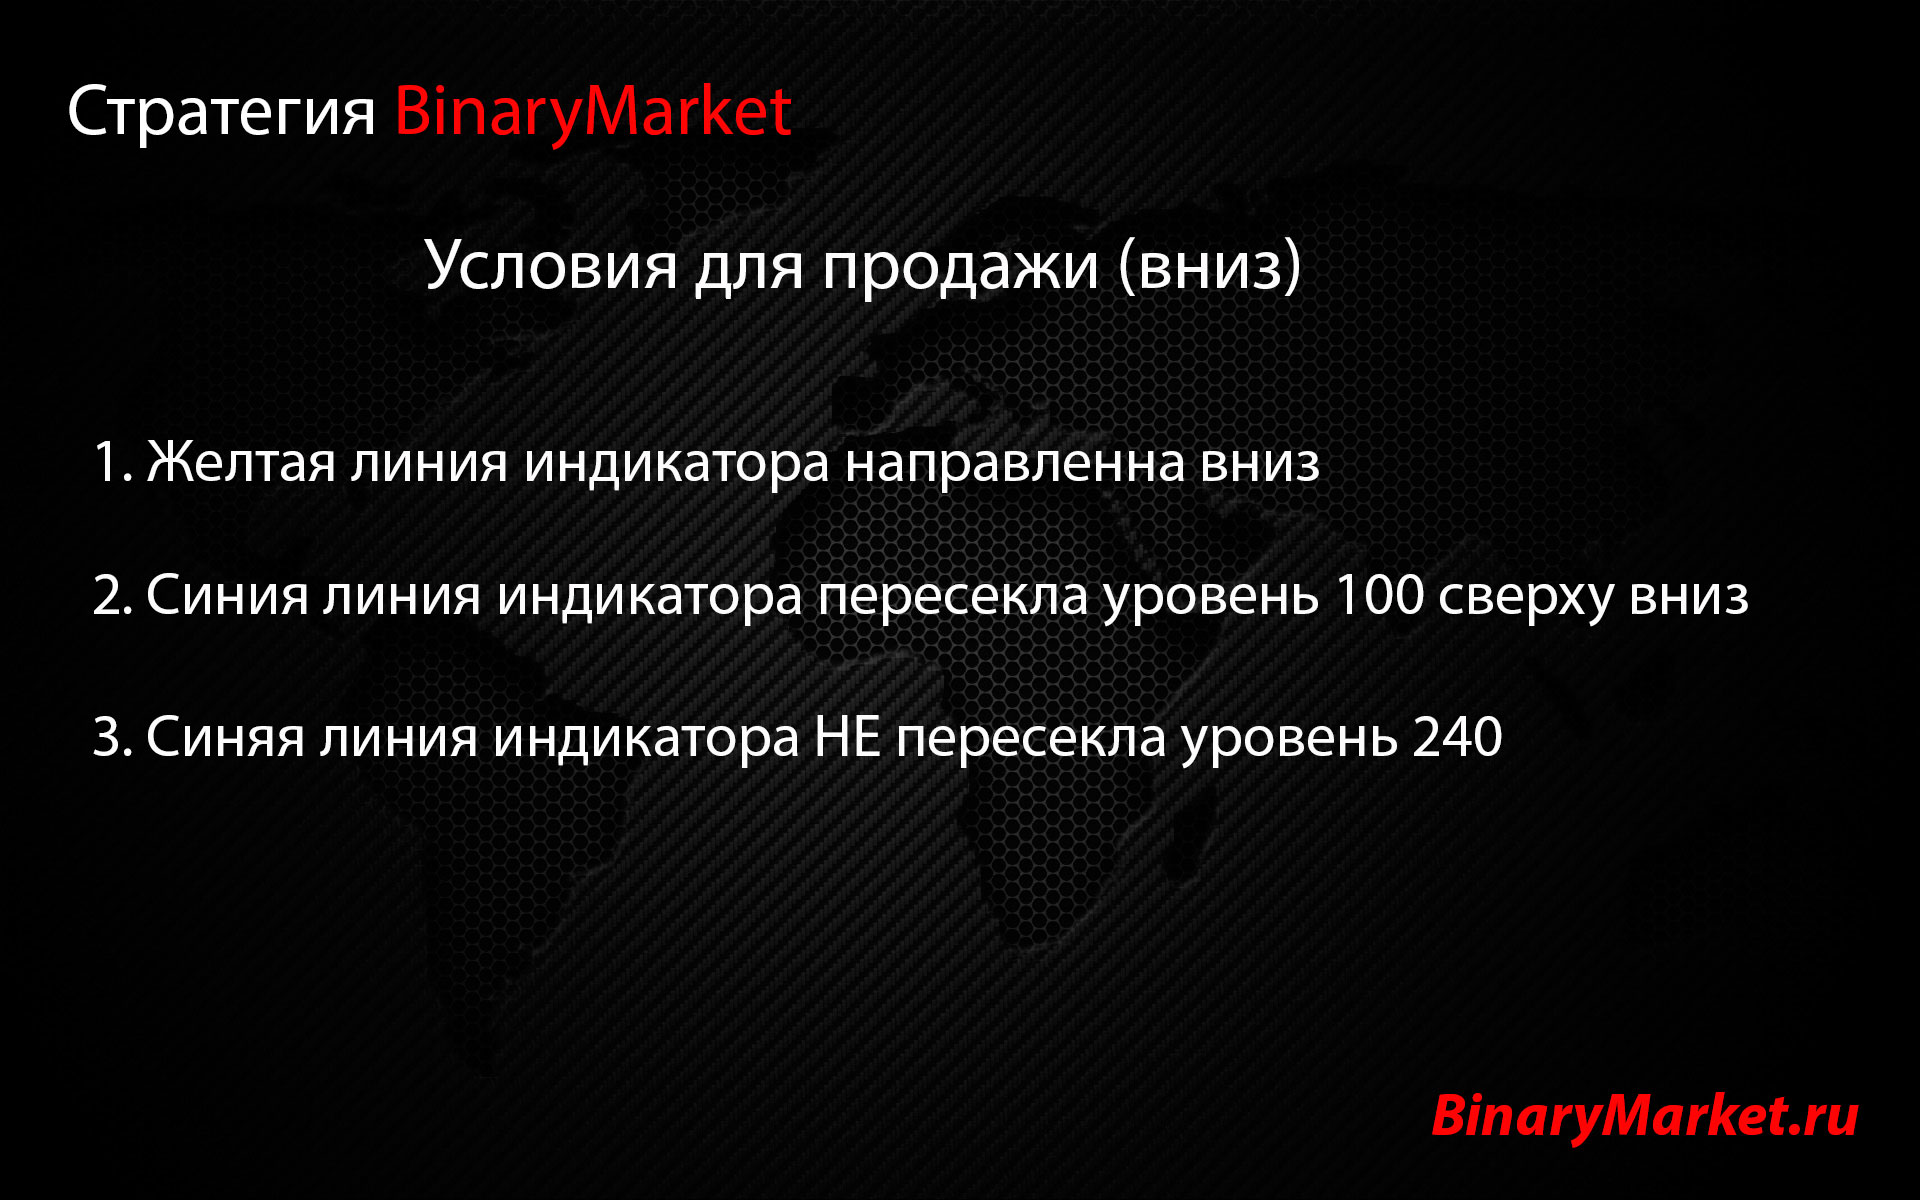 Правила продажи (опцион put)